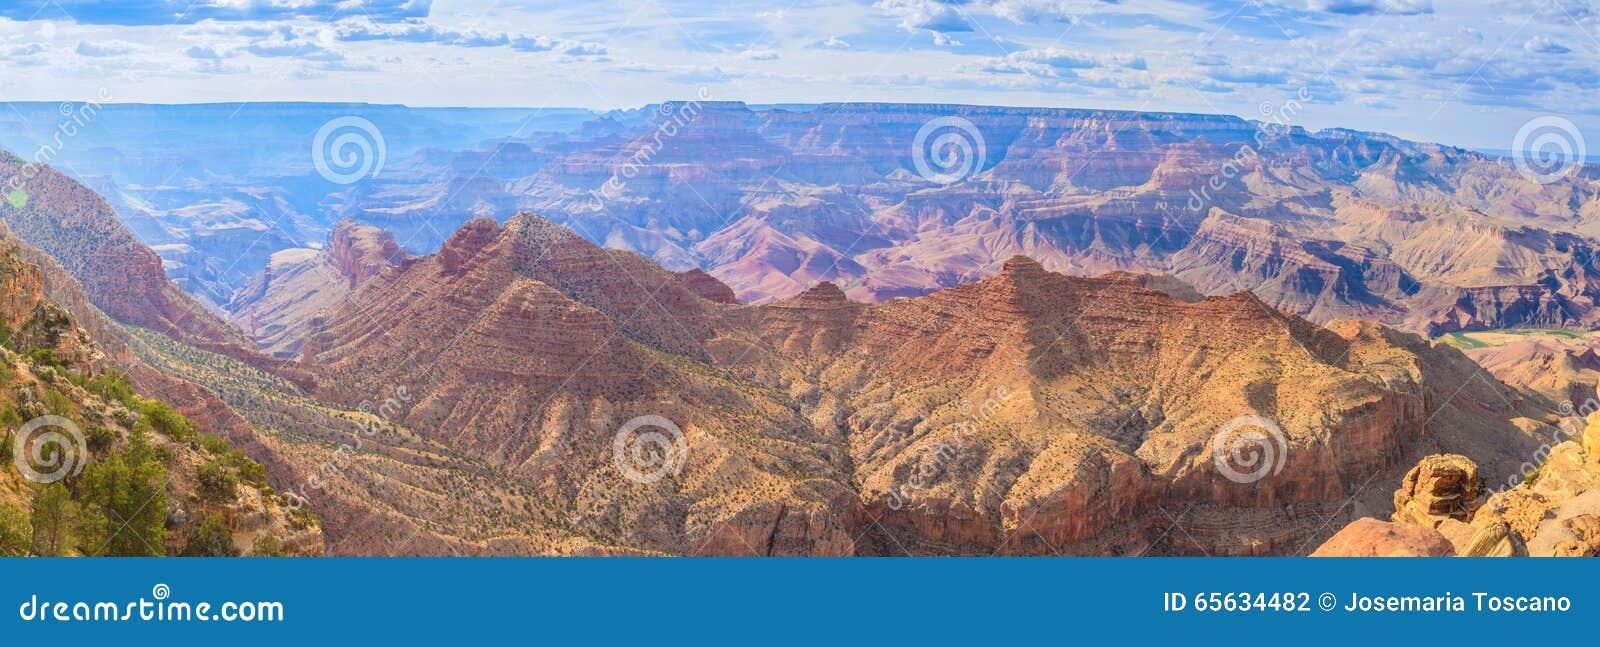 Belle image de Grand Canyon